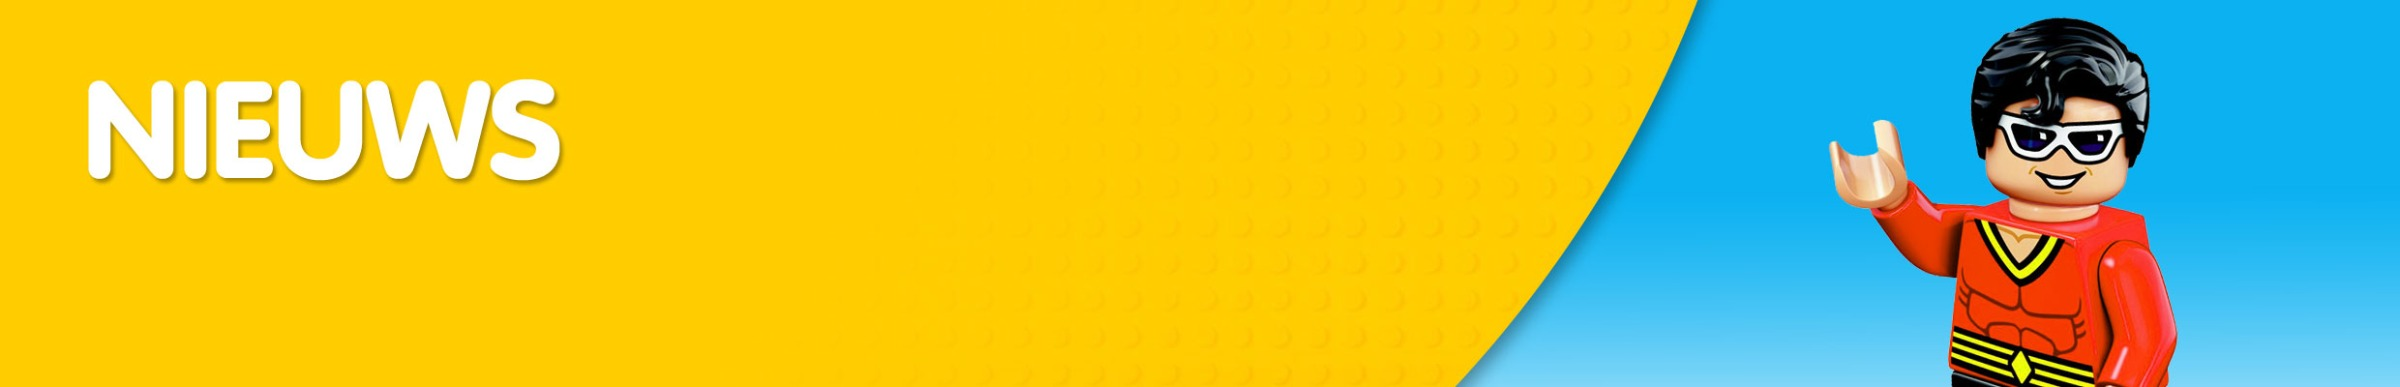 Banner LEGO Nieuws  - Misterbricks